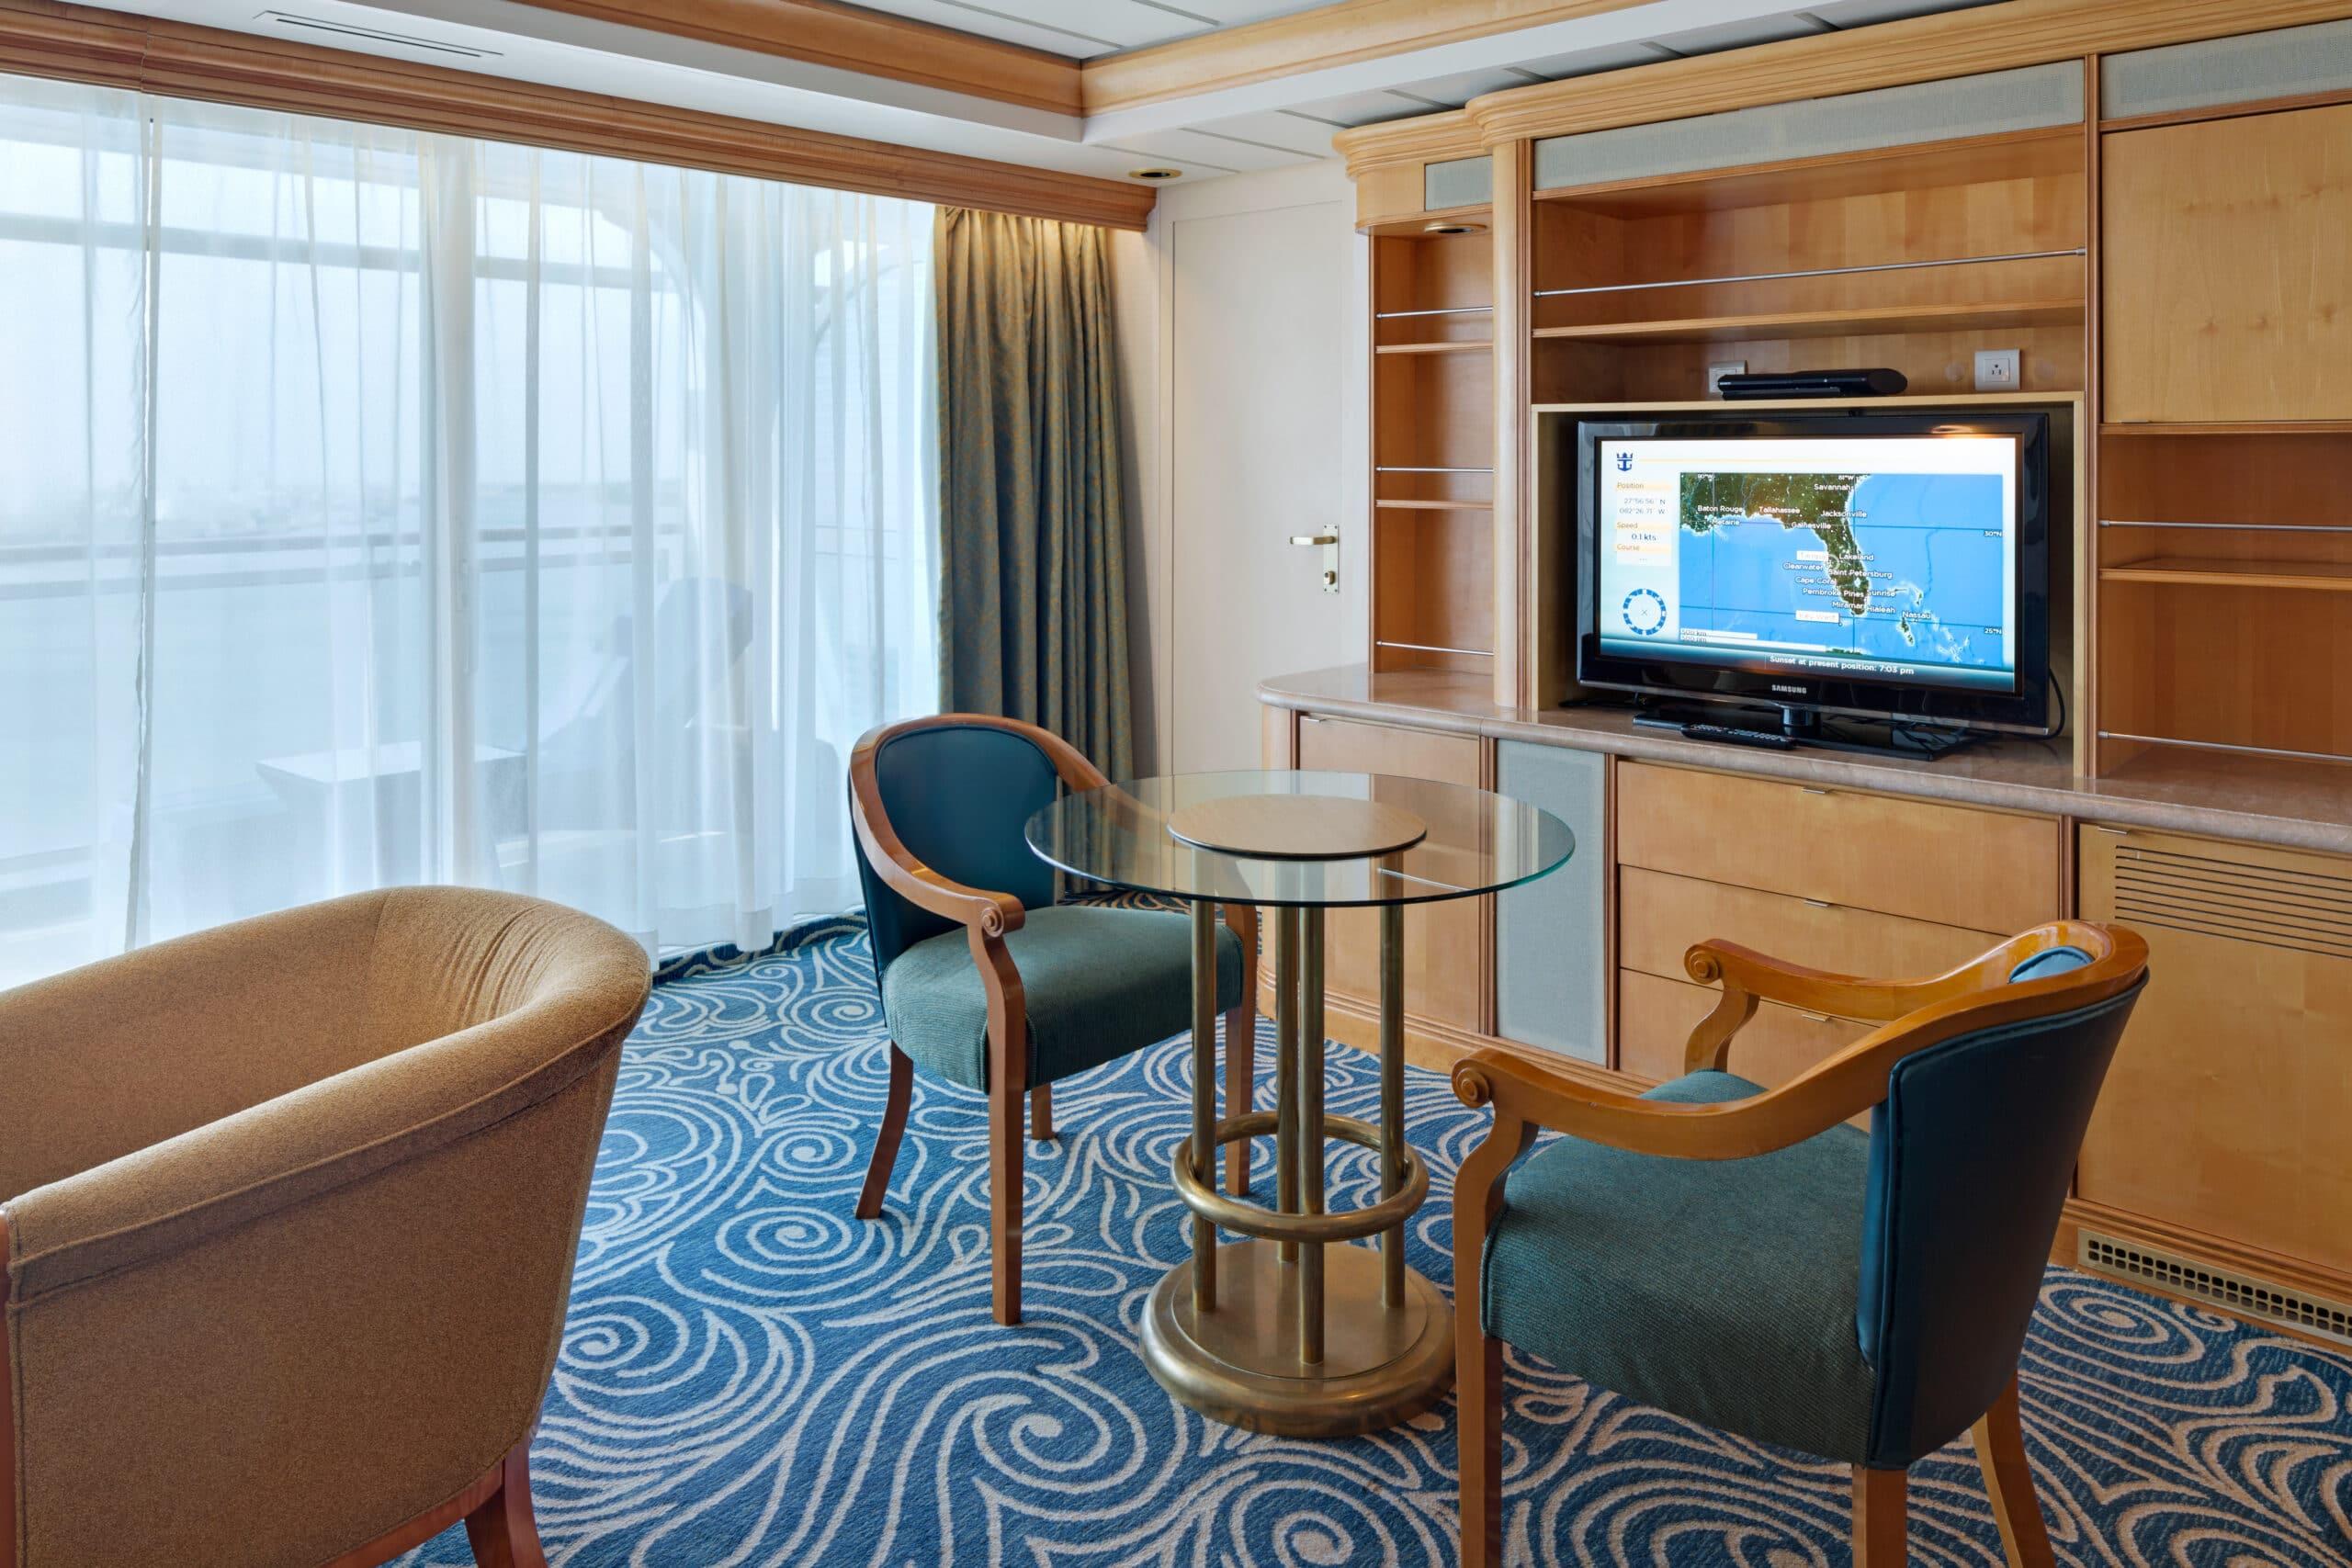 Royal-Caribbean-International-Rhapsody-of-the-Seas-schip-cruiseschip-categorie-OS-Owner-Suite